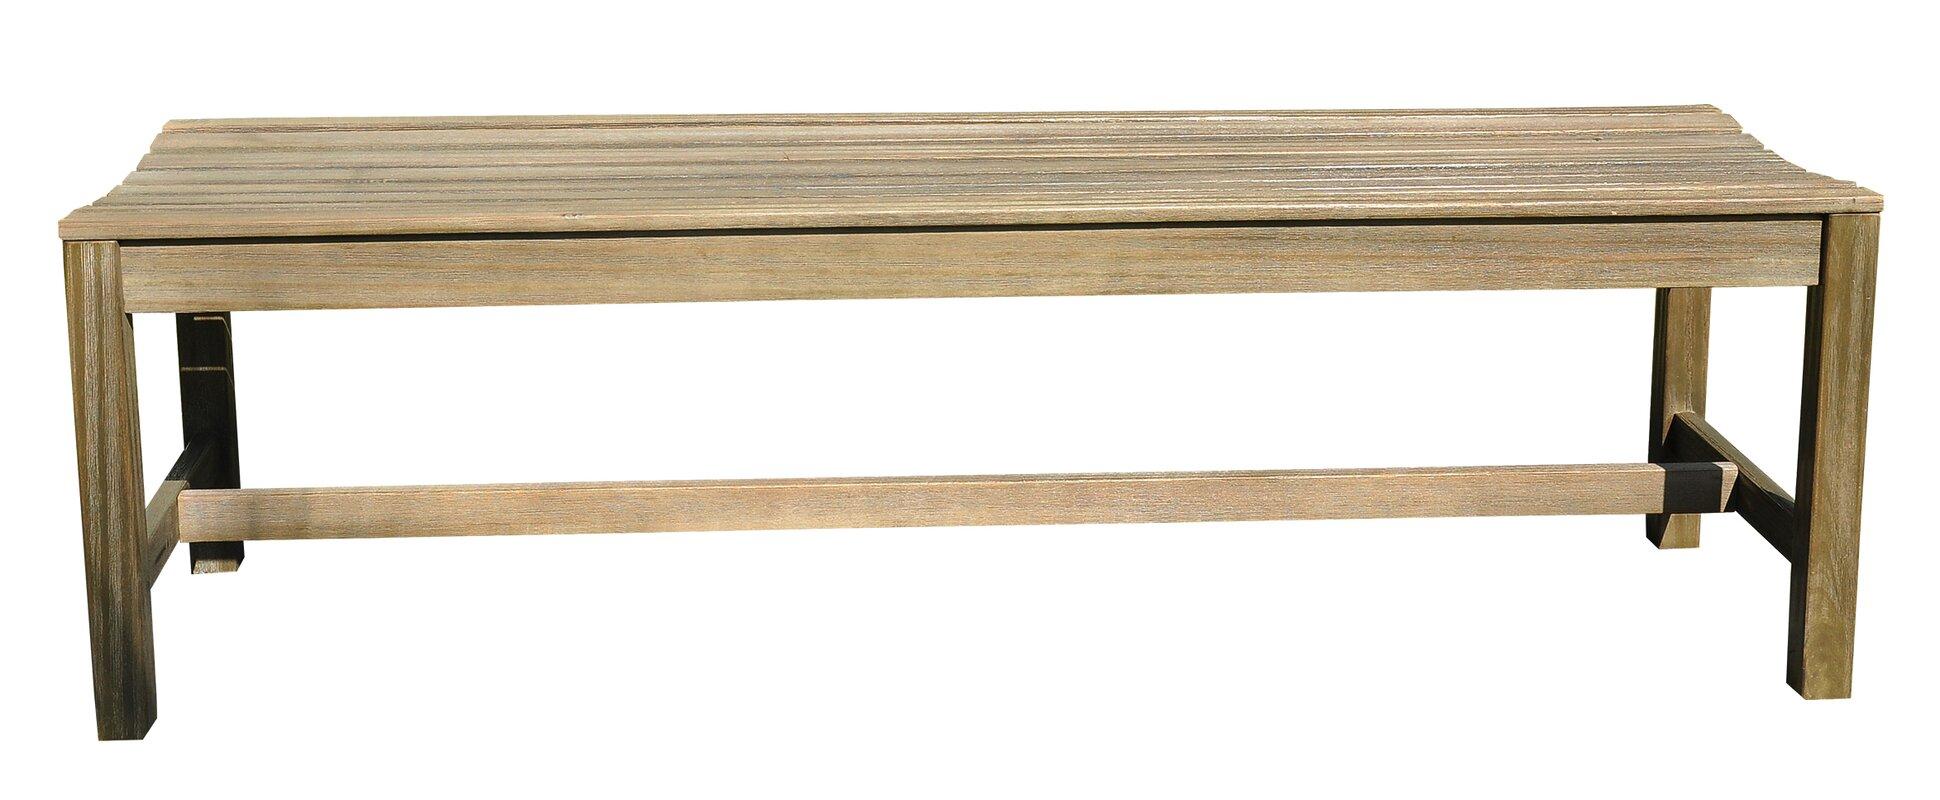 Densmore Wood Picnic Bench